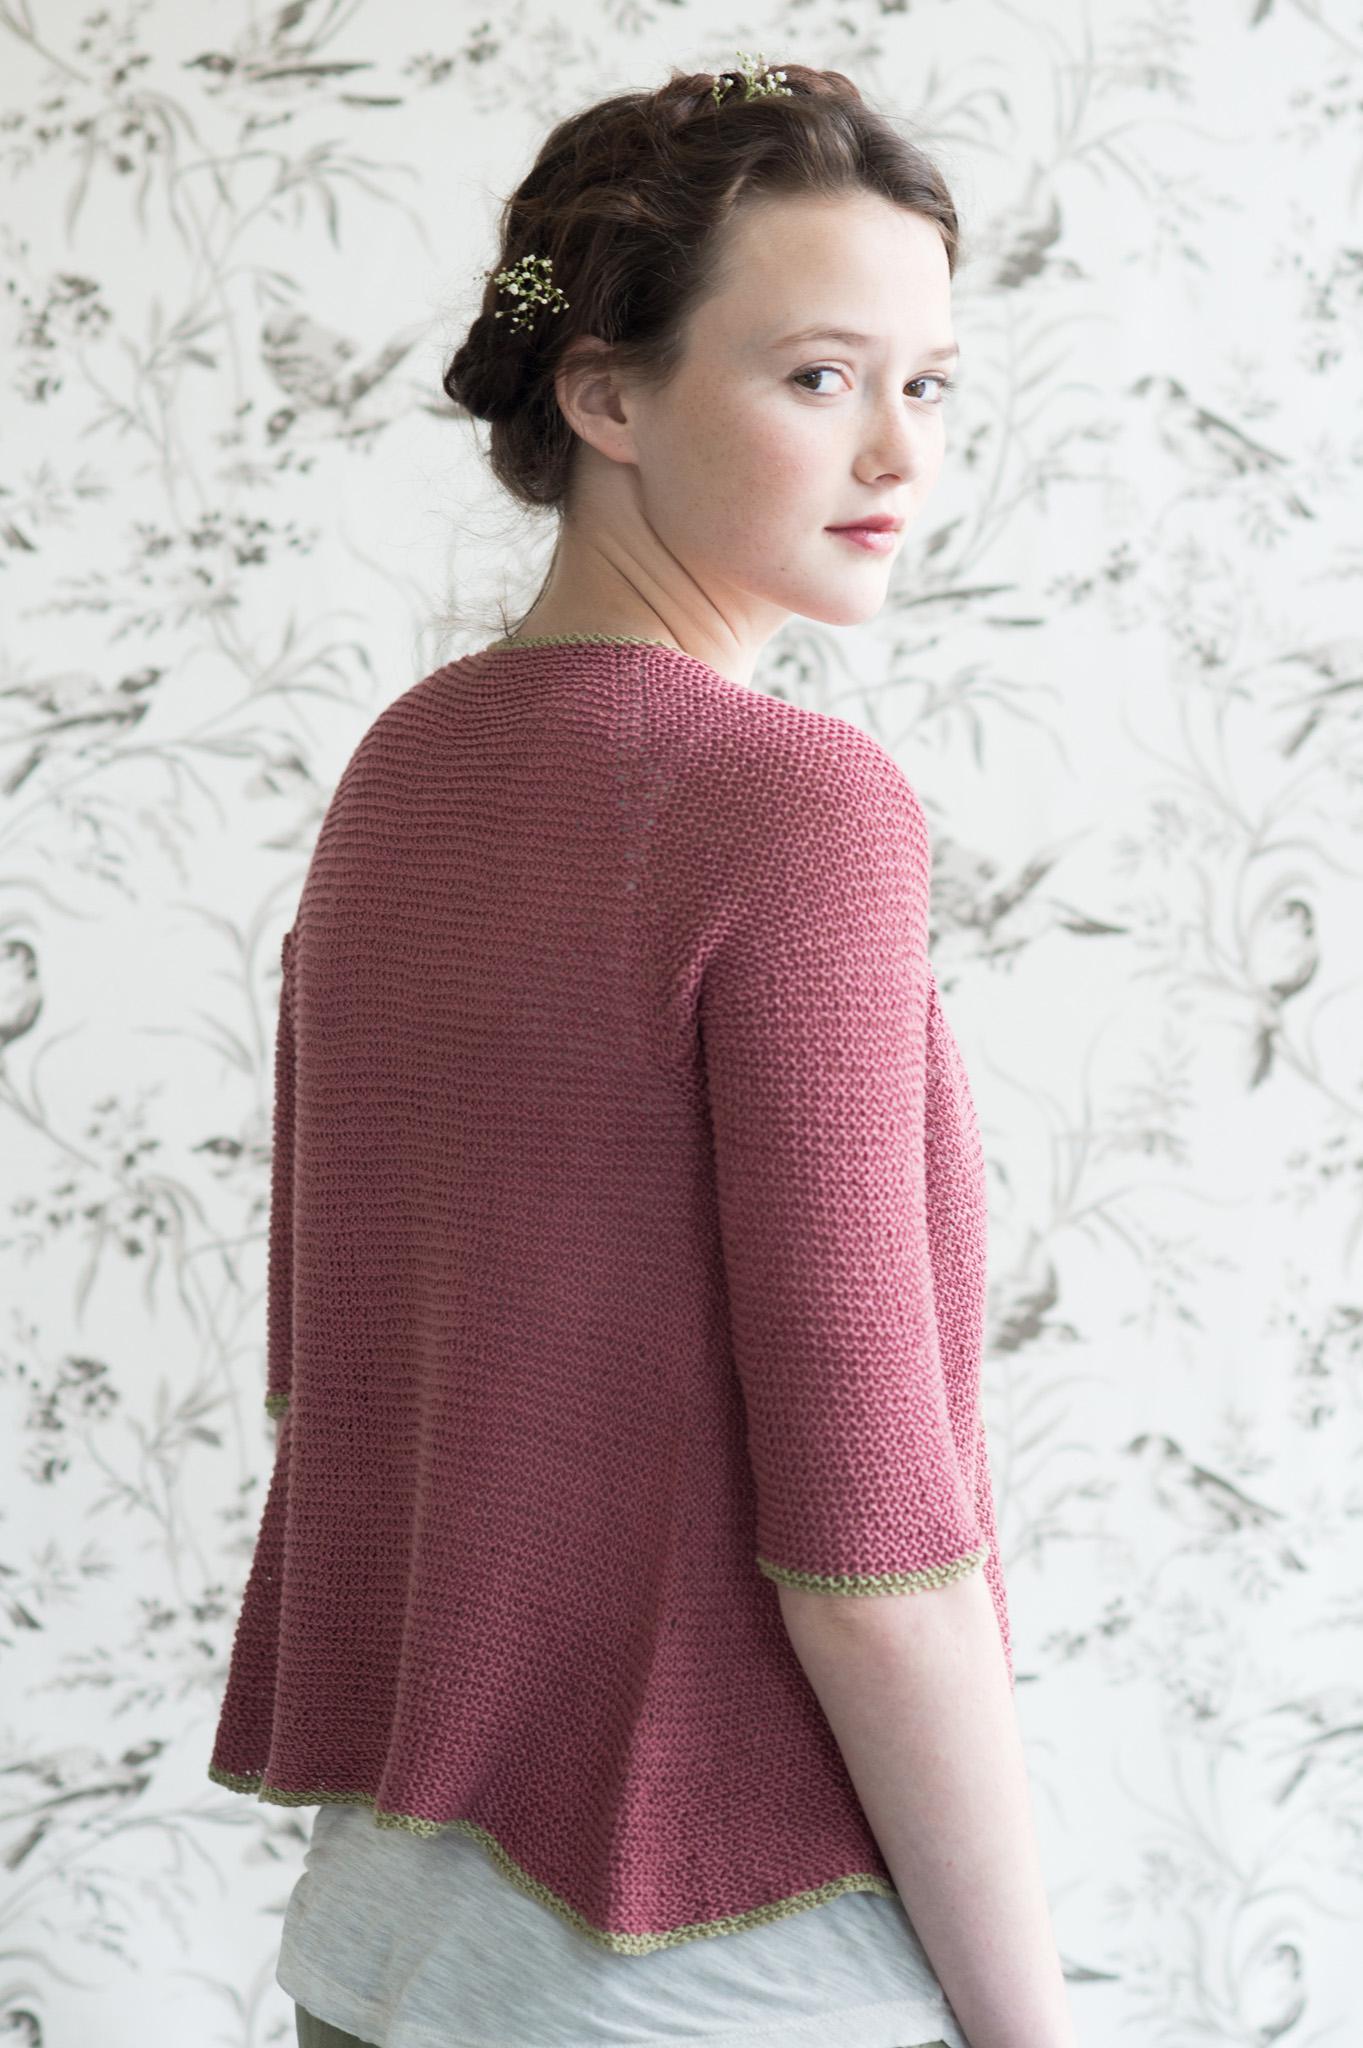 -quince-co-petunia-pam-allen-knitting-pattern-sparrow-2.jpg